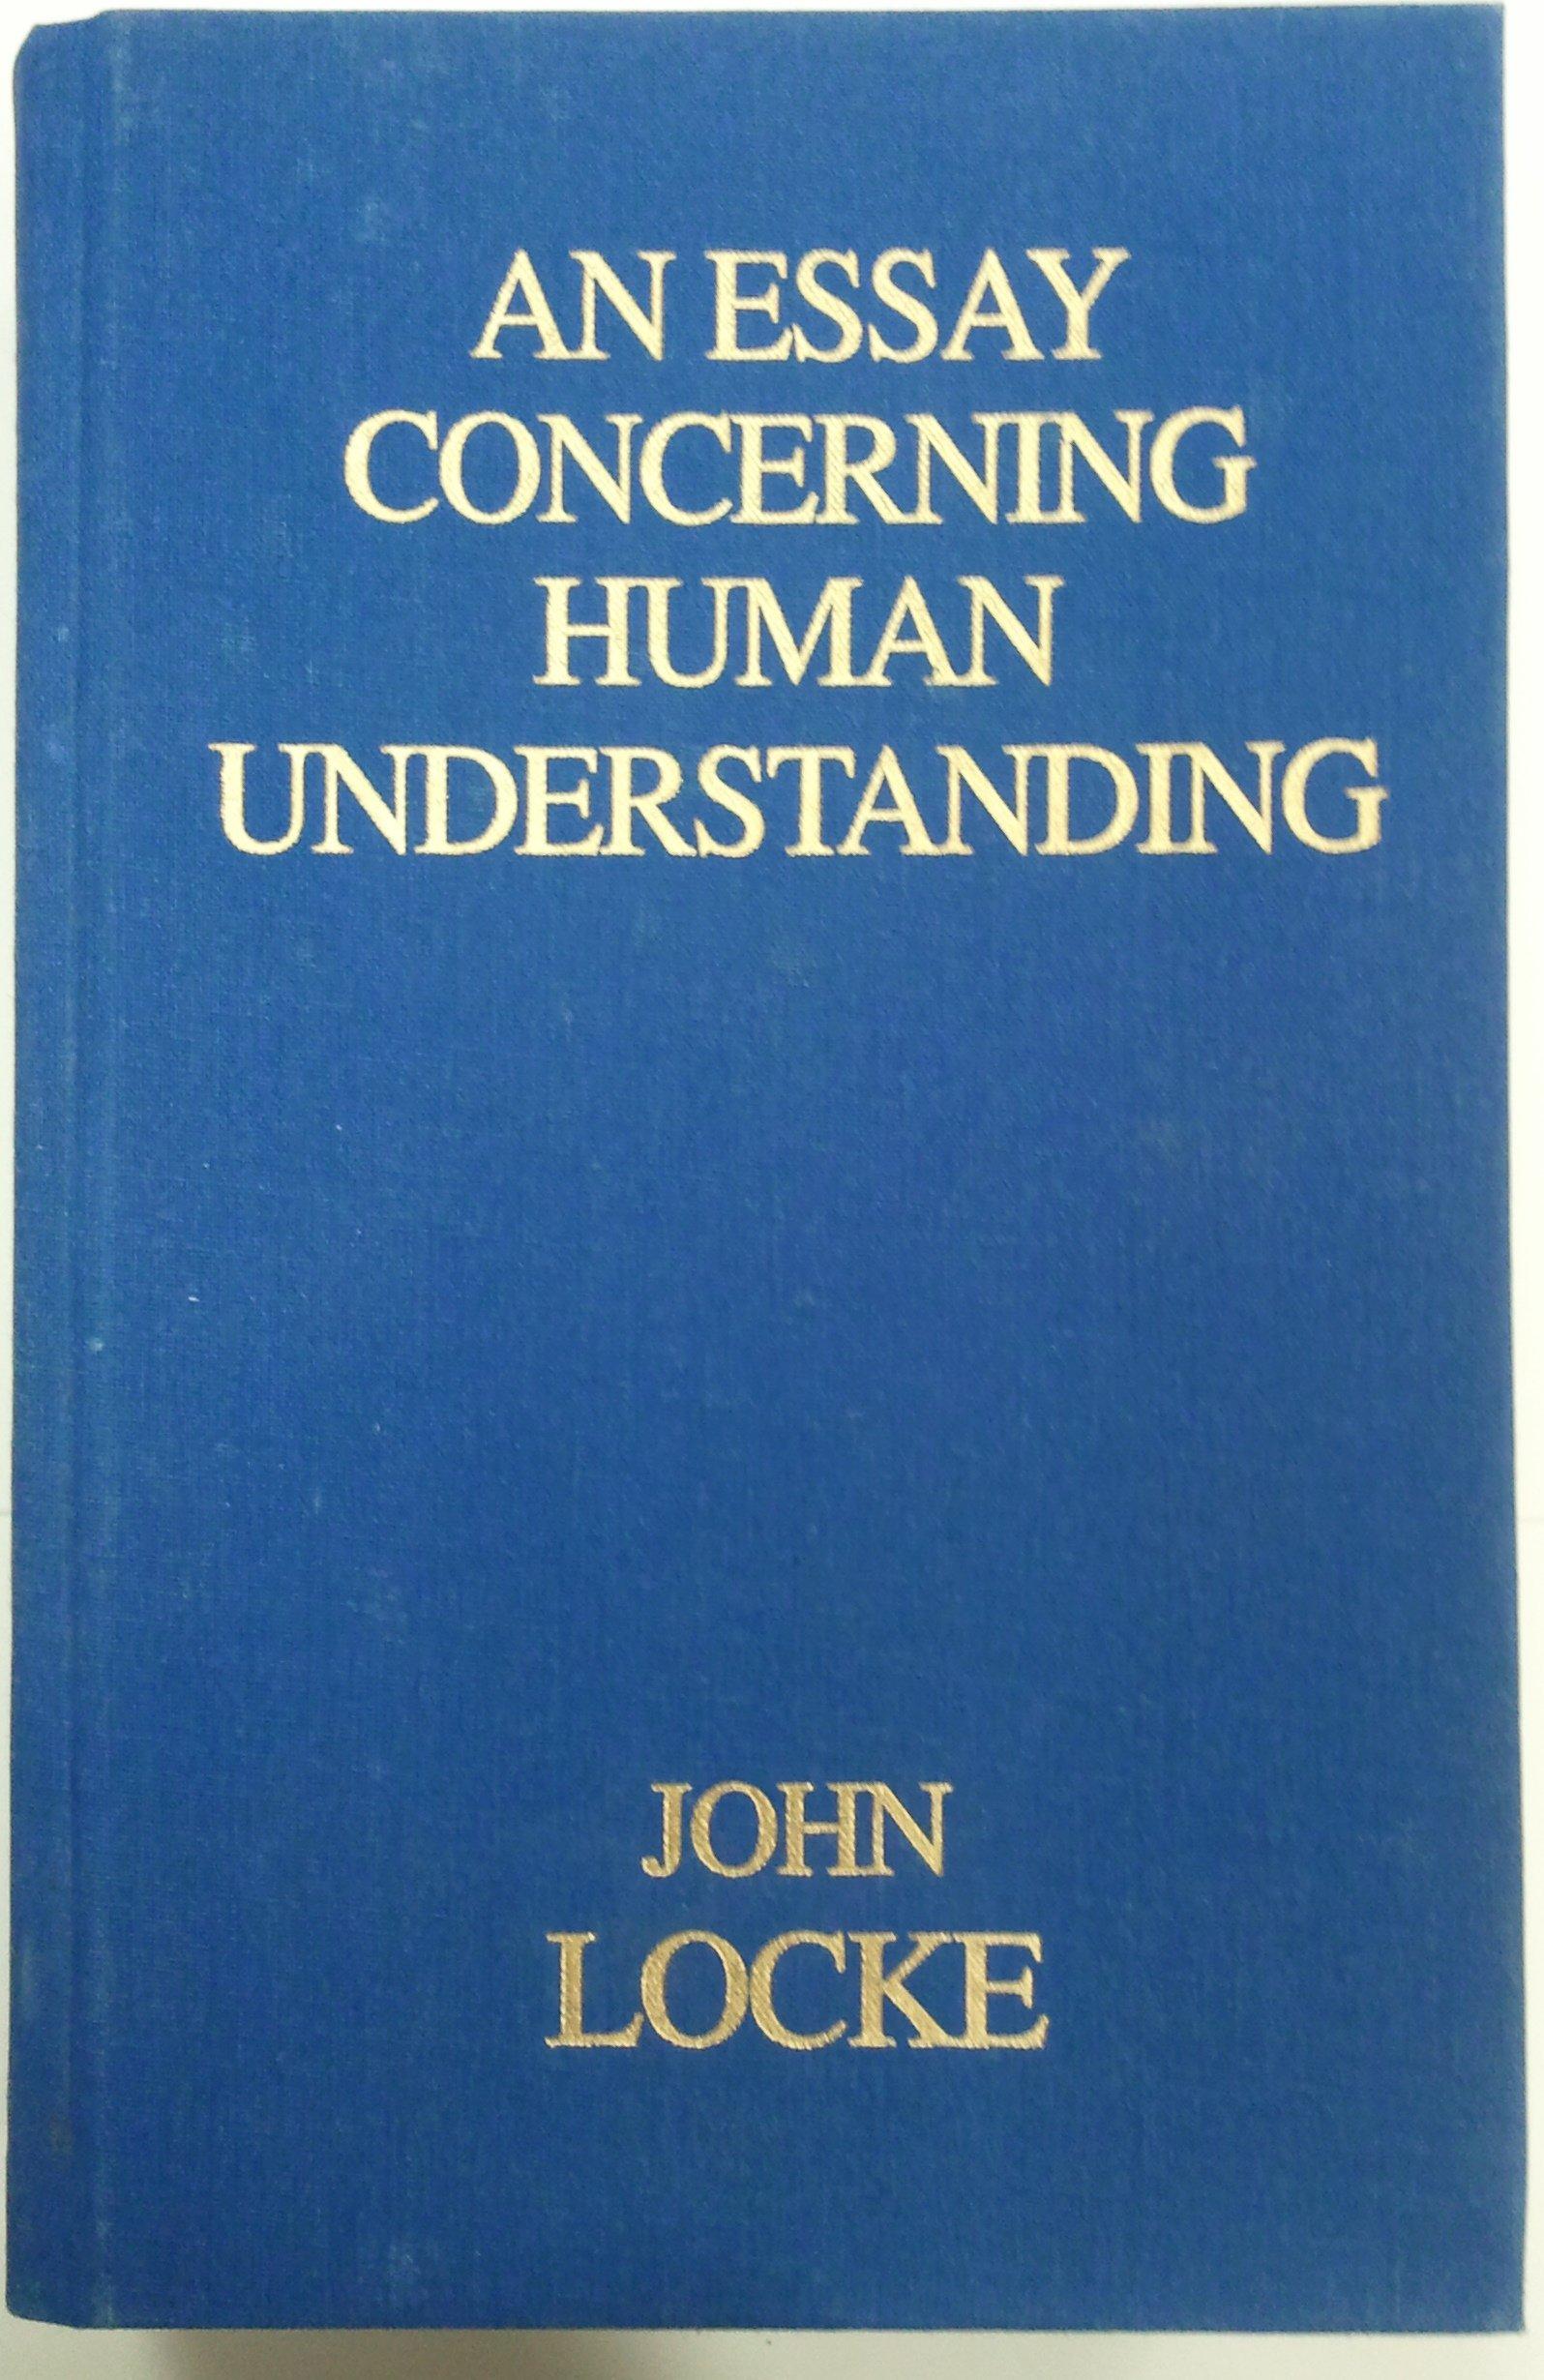 008 John Locke Essay Example Impressive Concerning Human Understanding Book 4 On Pdf Summary Full